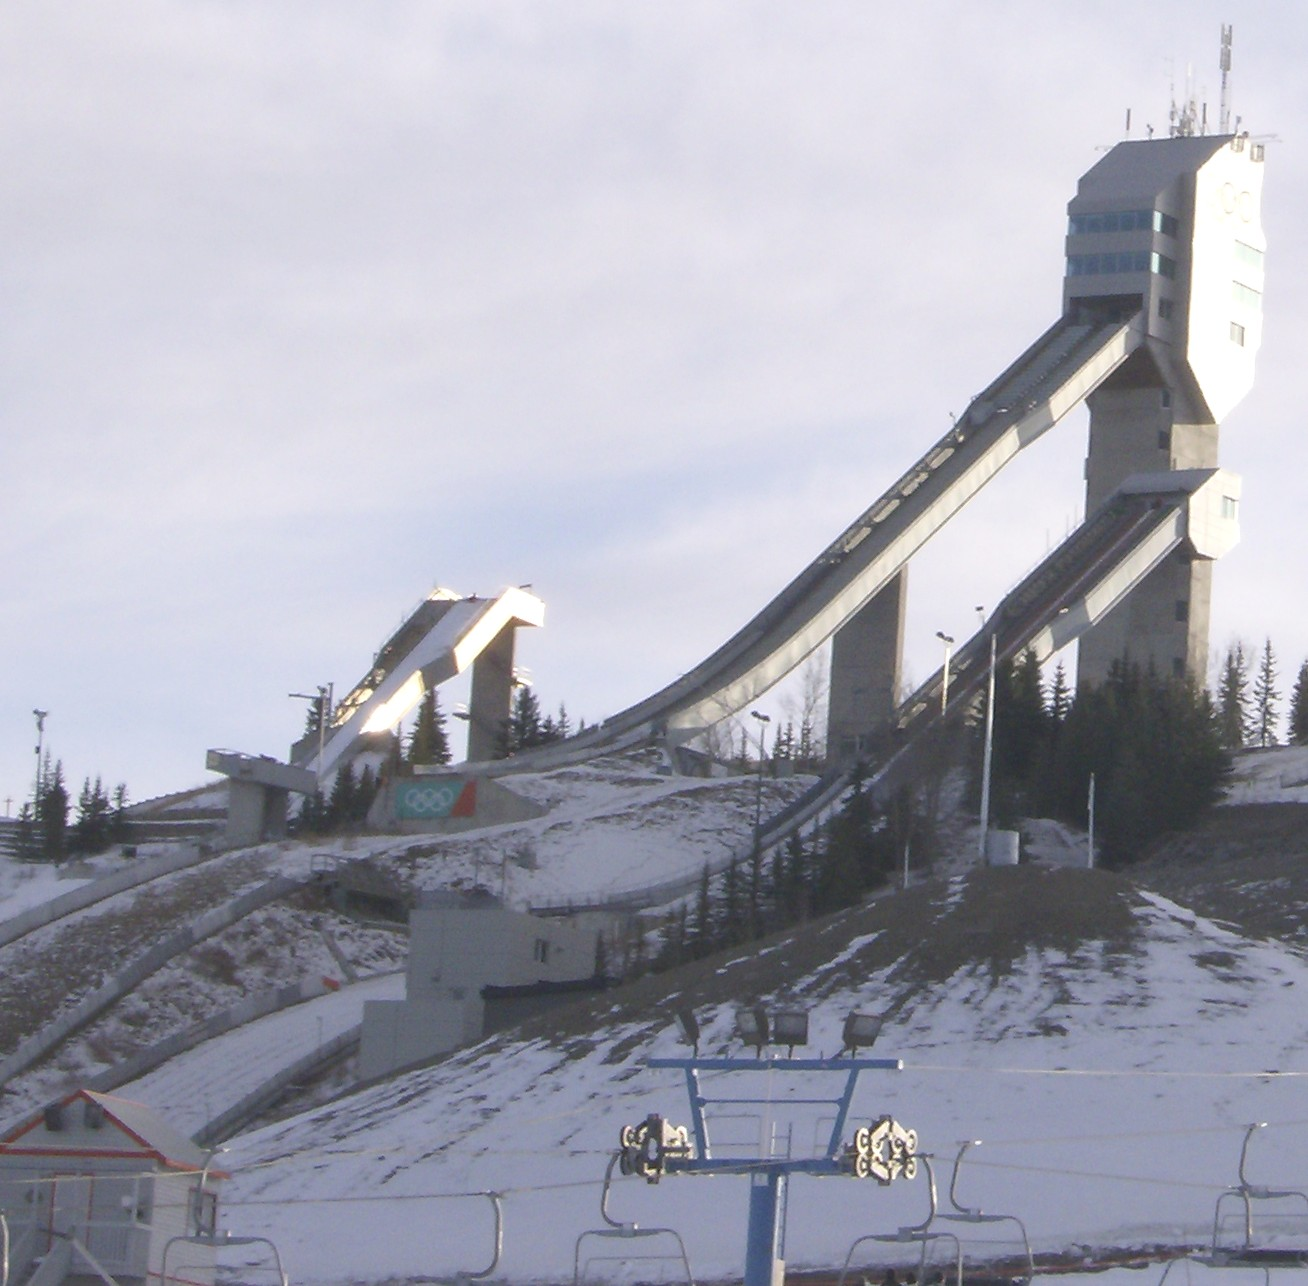 canada olympic park 2006 dec 10 - 8.jpg